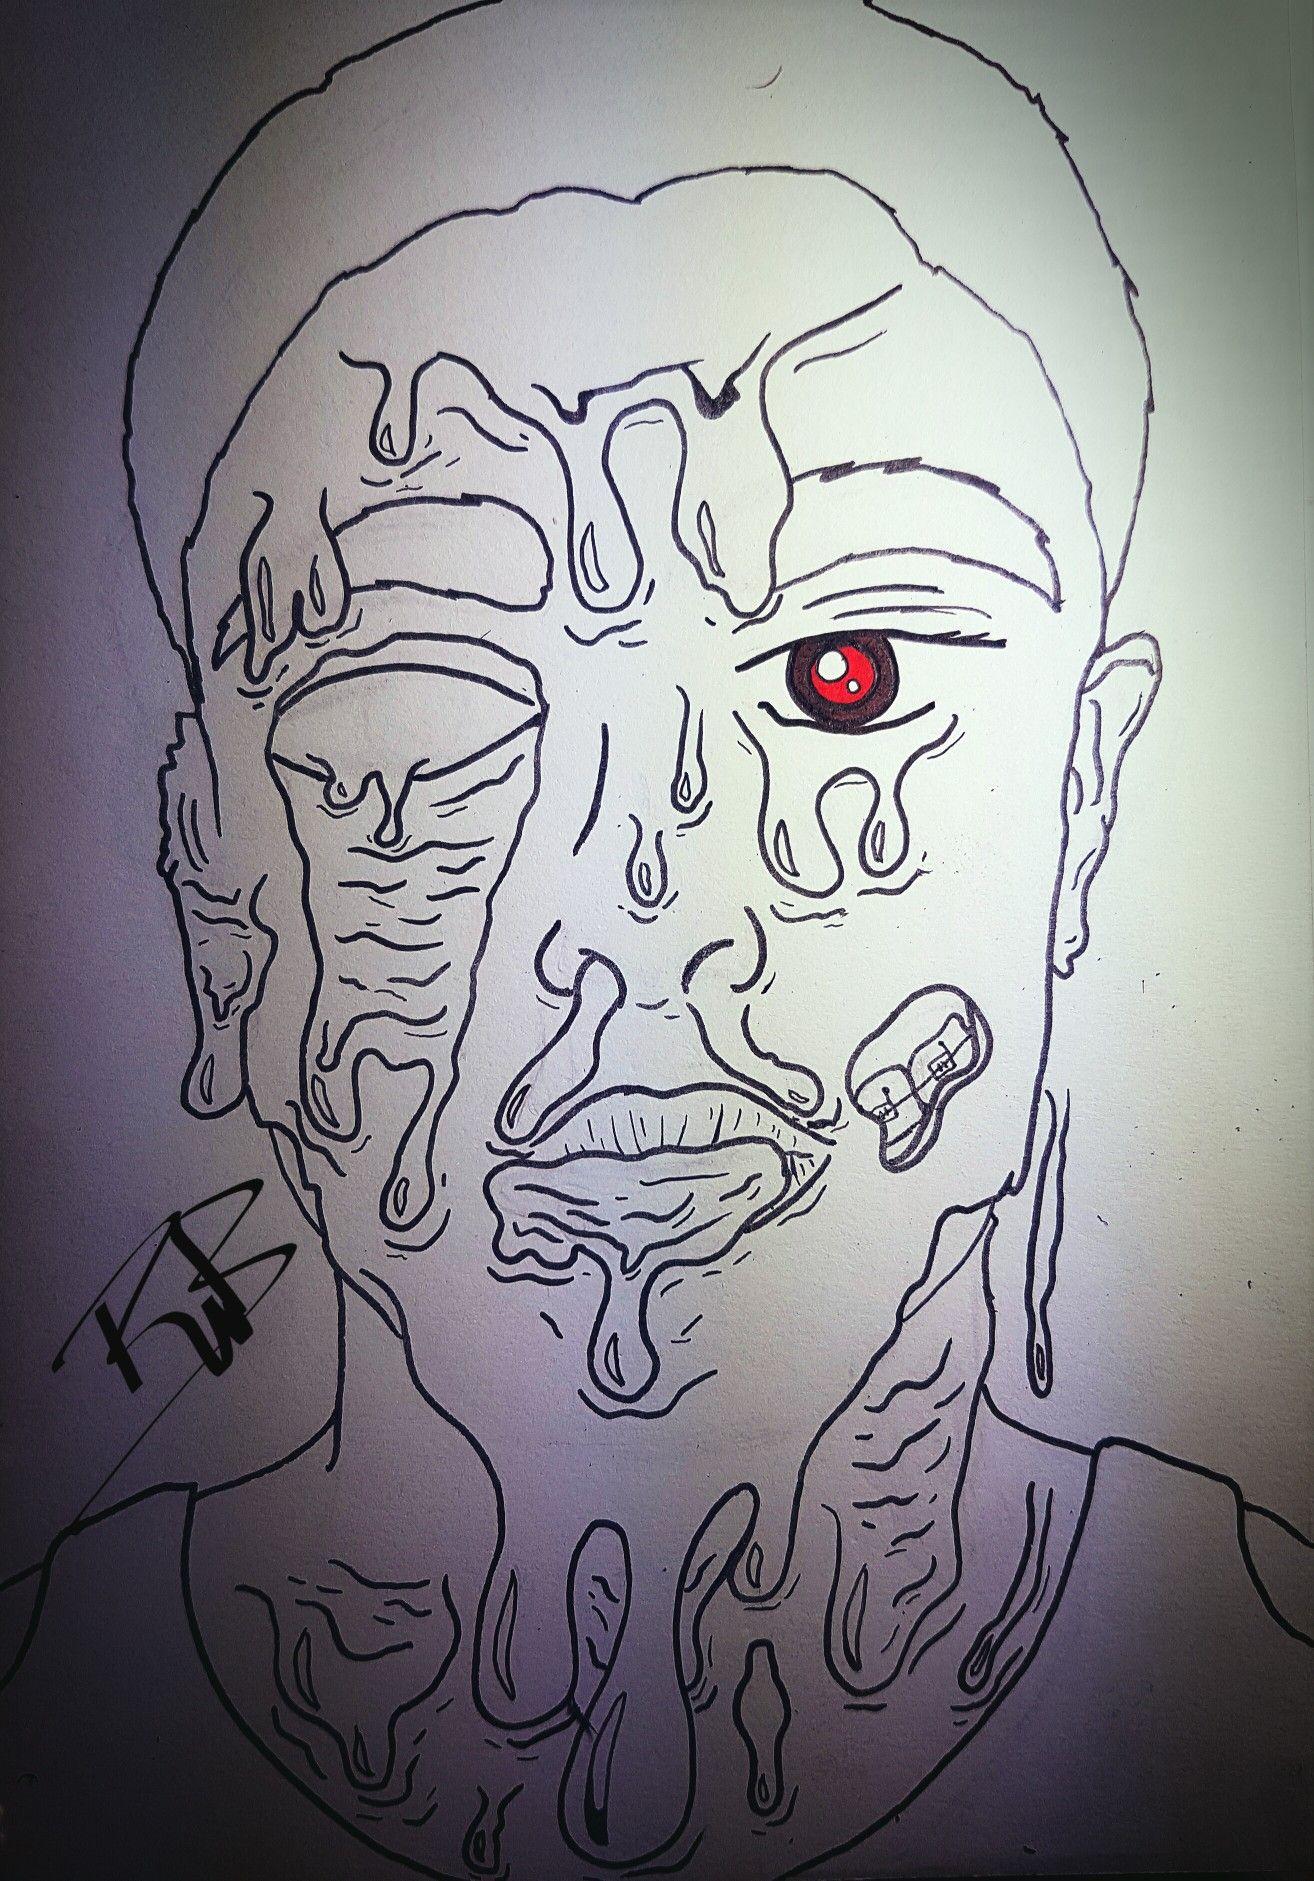 #myself #zombie #face #melting